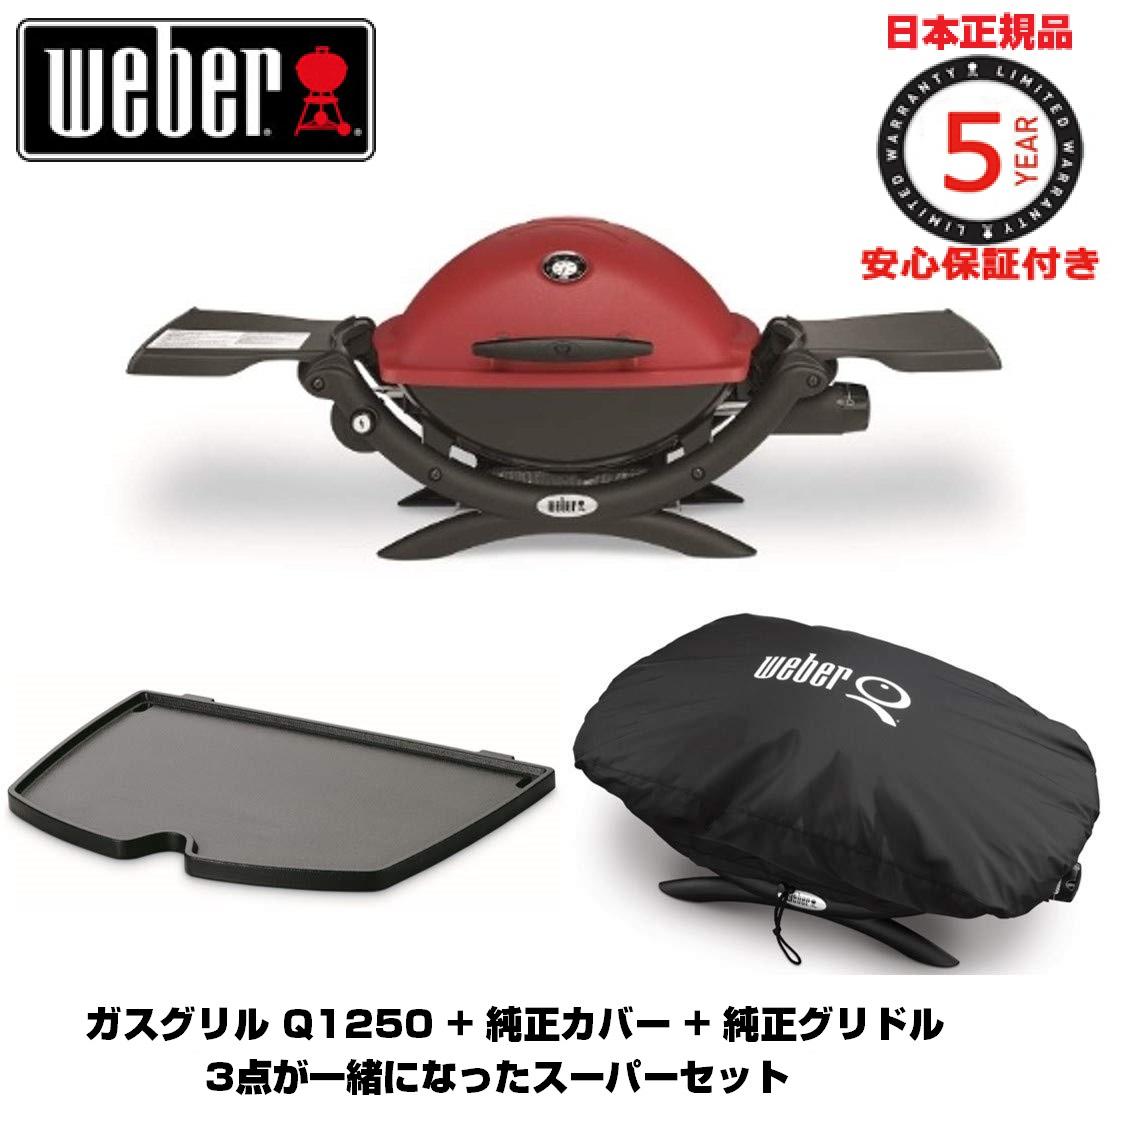 Weber 51042208 キャンプQ Q1250 専用カバーとグリドルが付いたスーパーセット LPガスカートリッジ対応グリル